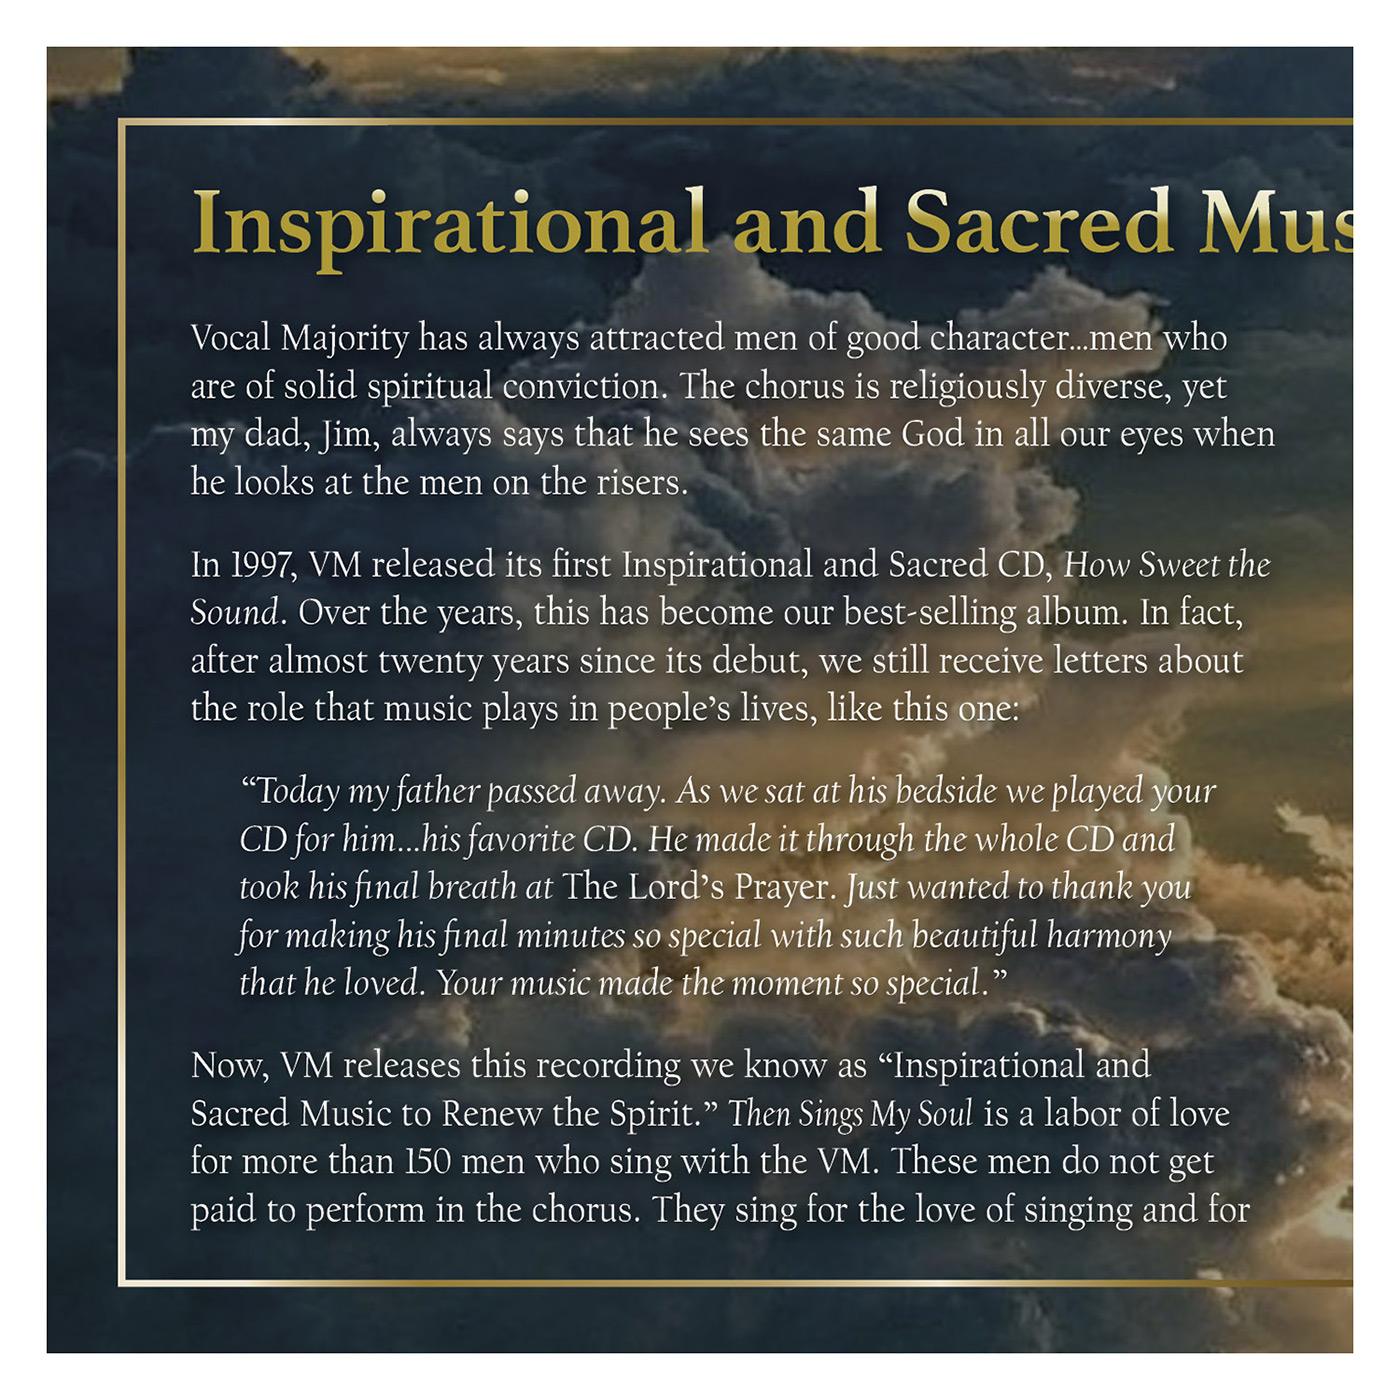 Booklet Inside Panel 1 of 4: Then Sings My Soul